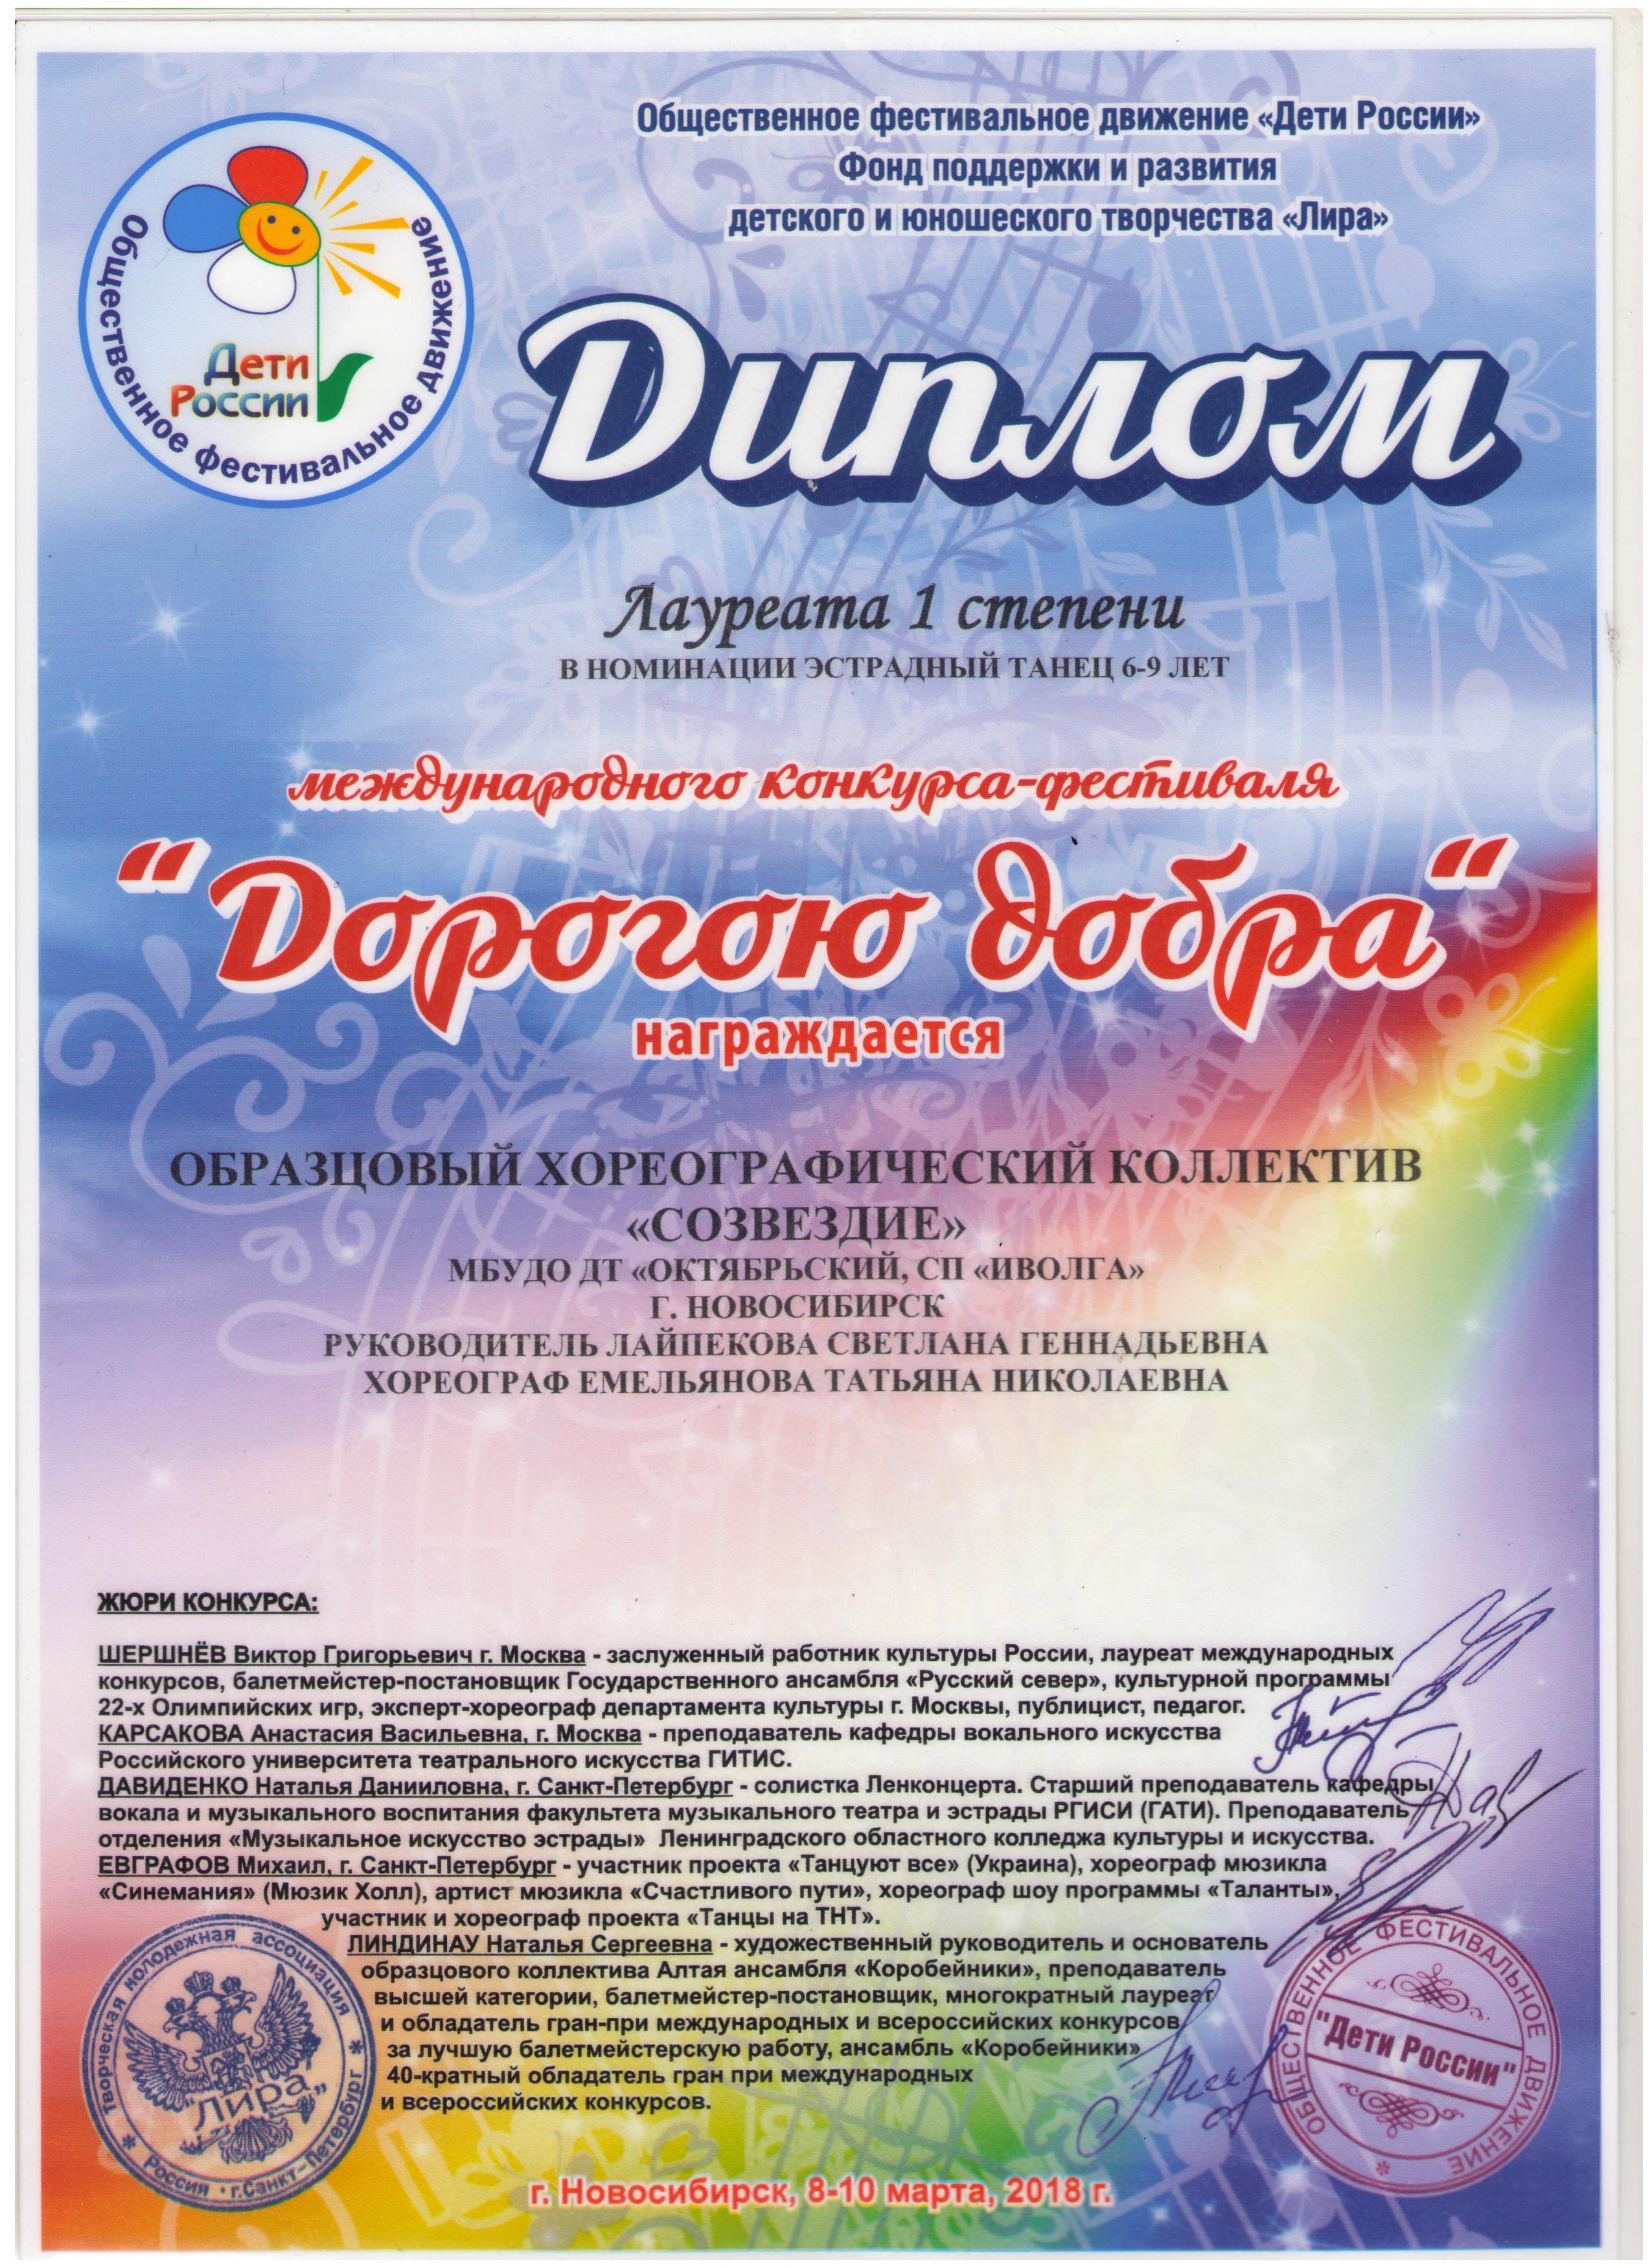 Младшие_Лауреат-1-степени-001